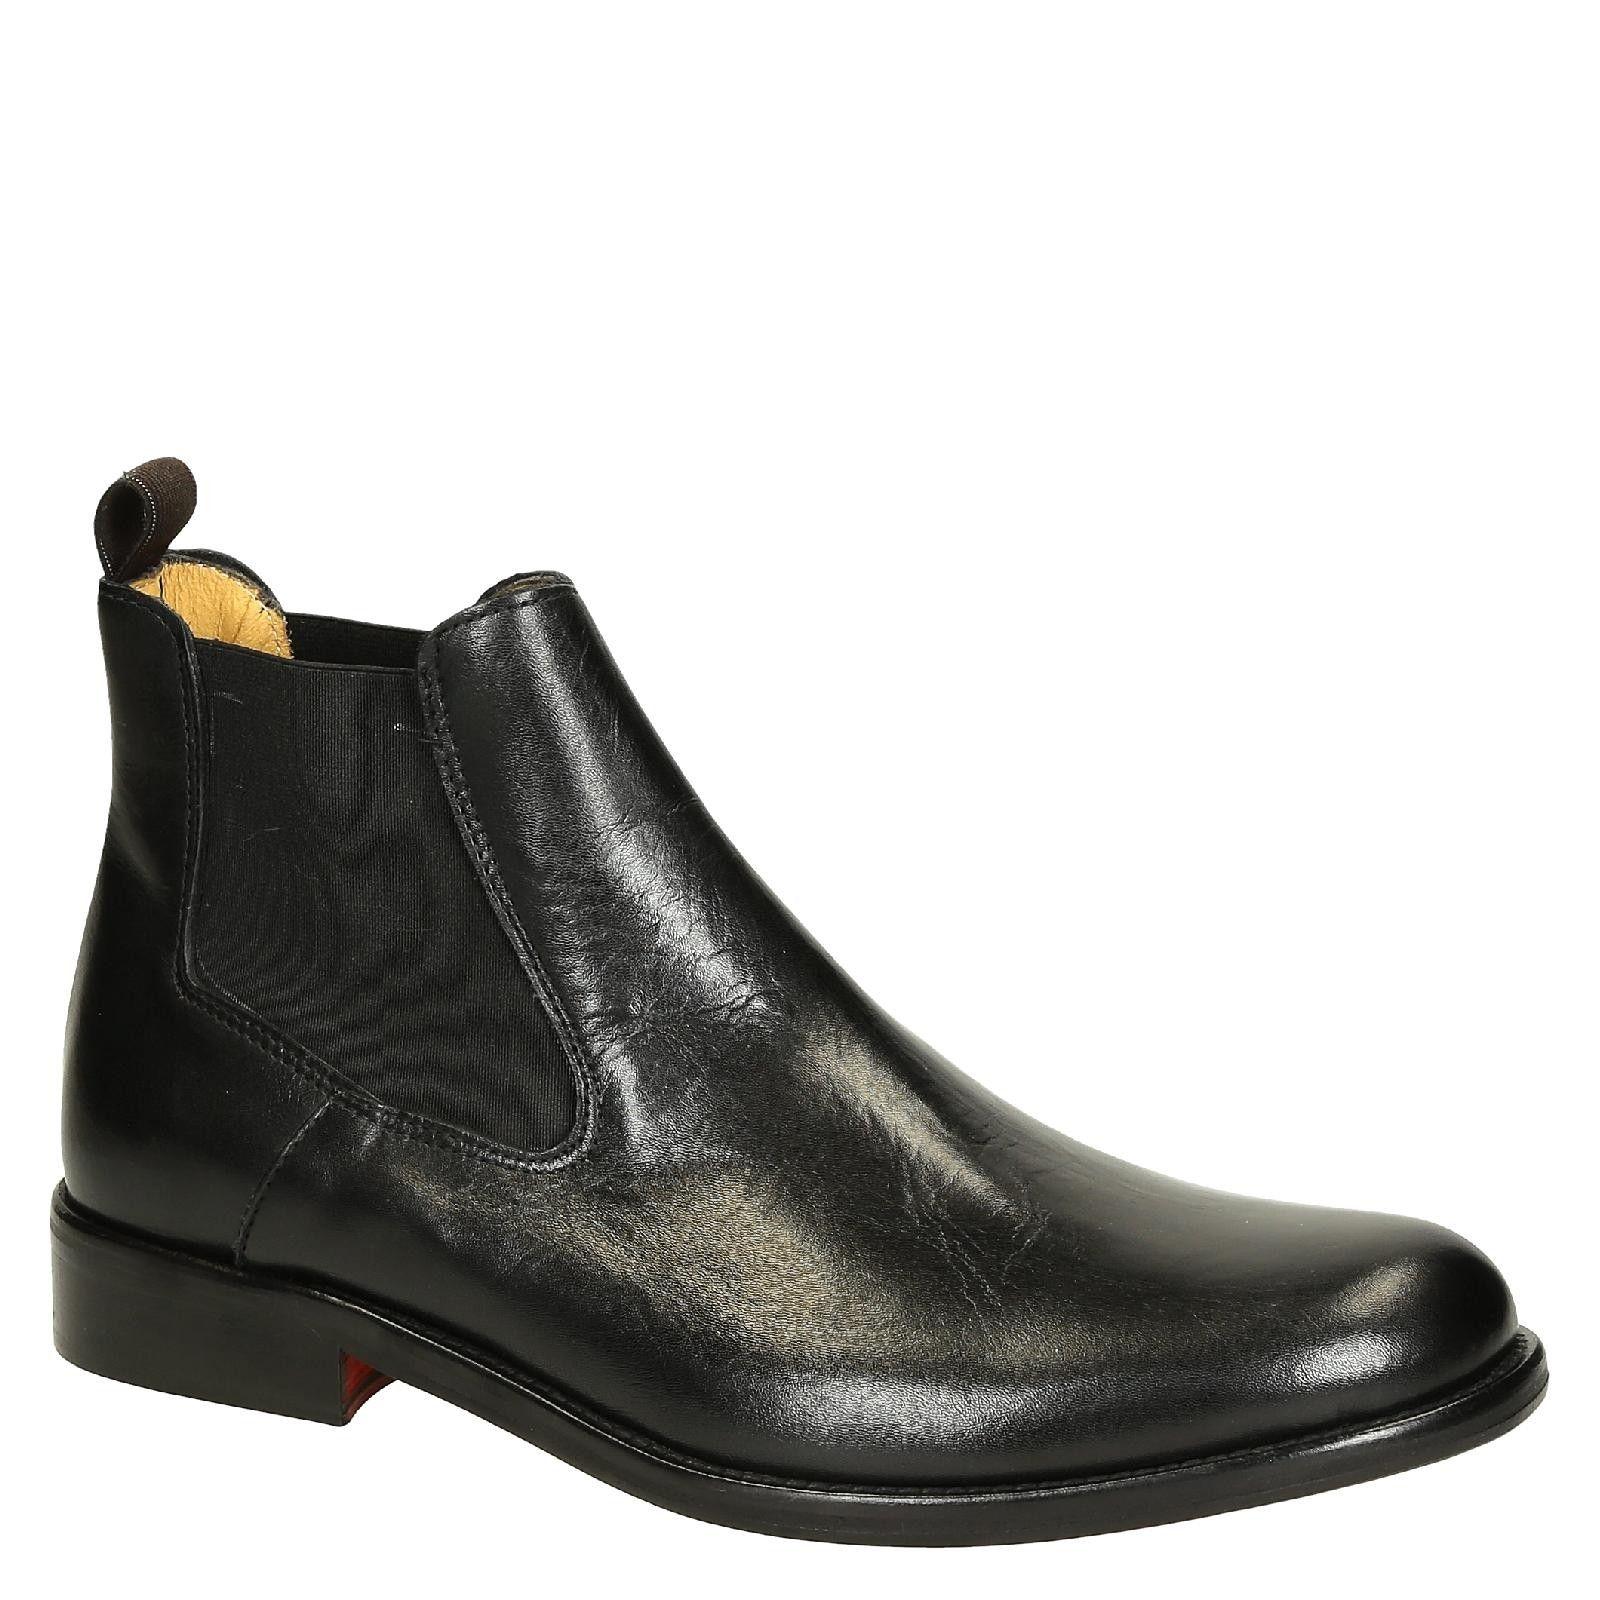 Black Lux Calf Leather Men S Chelsea Boots Handmade Italian Boutique